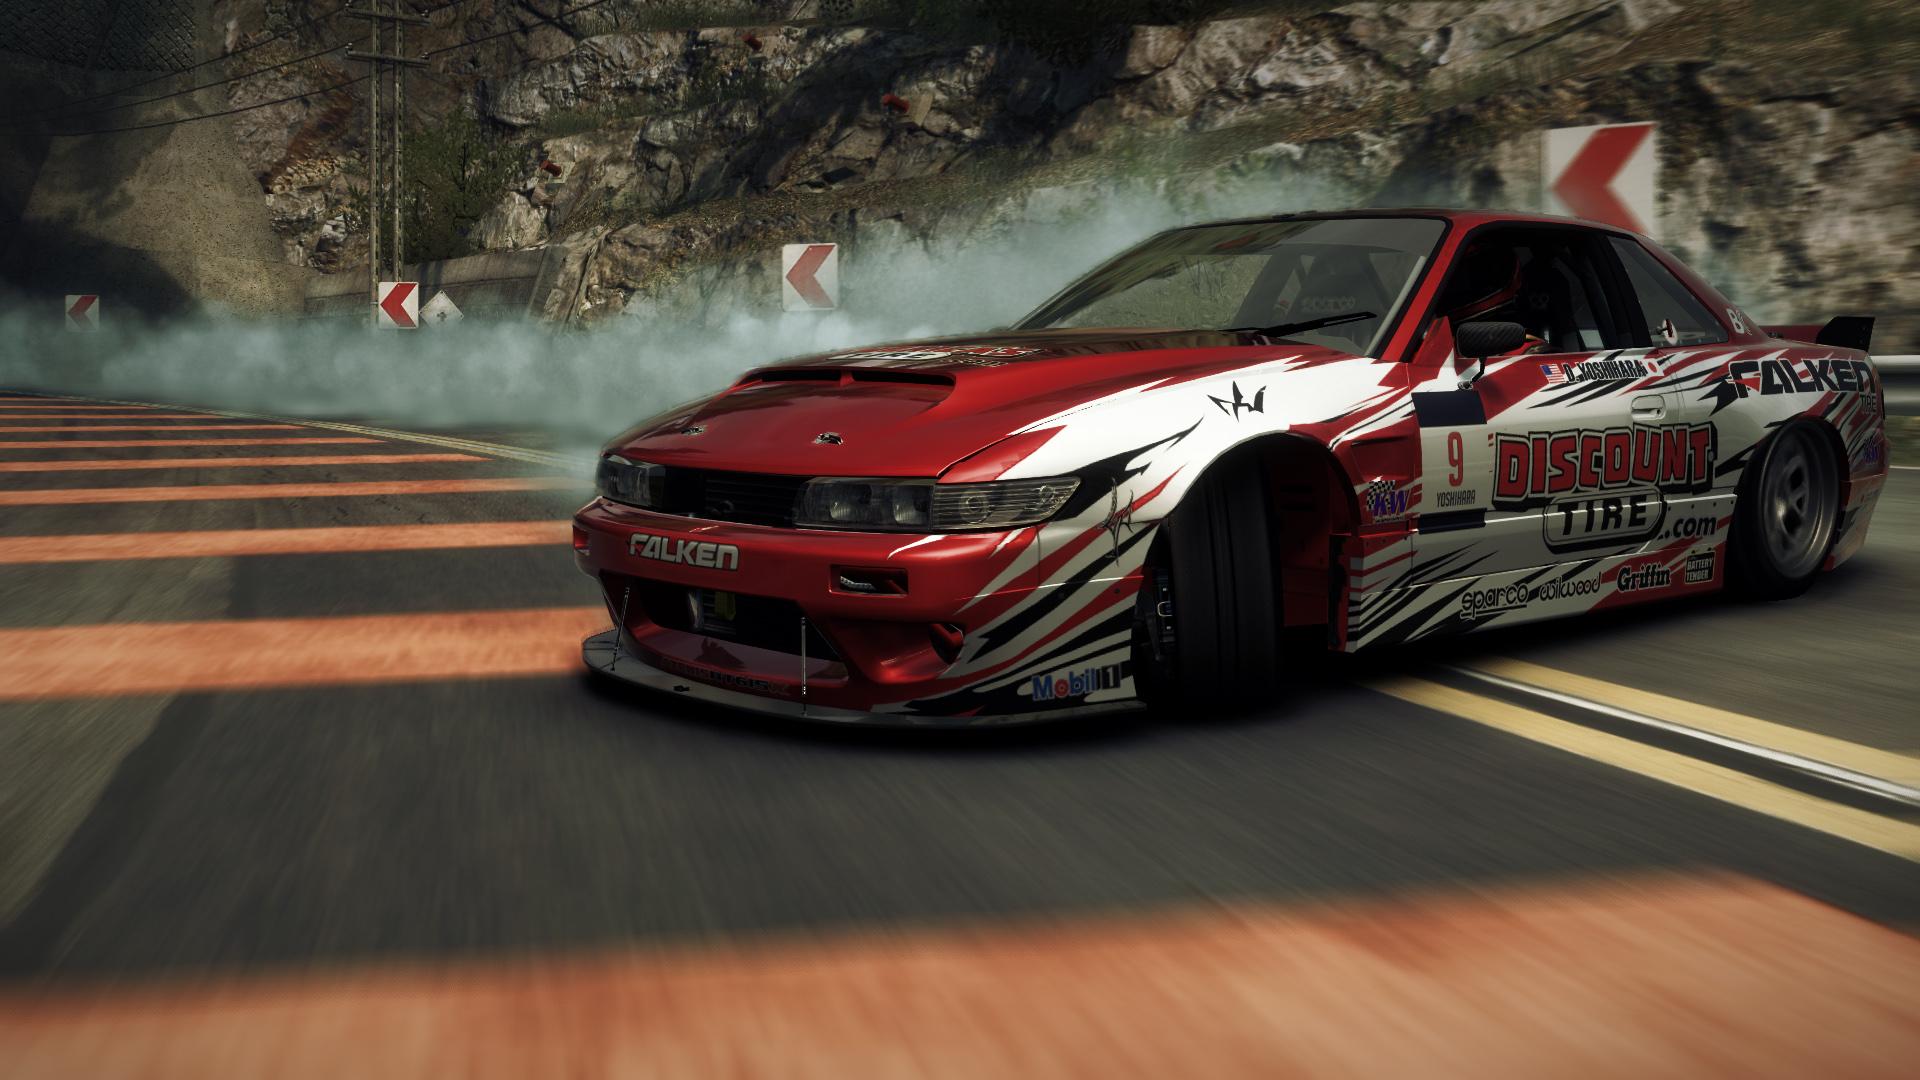 GRID 2 News: GRID 2: Drift Pack DLC Ab Sofort Verfügbar